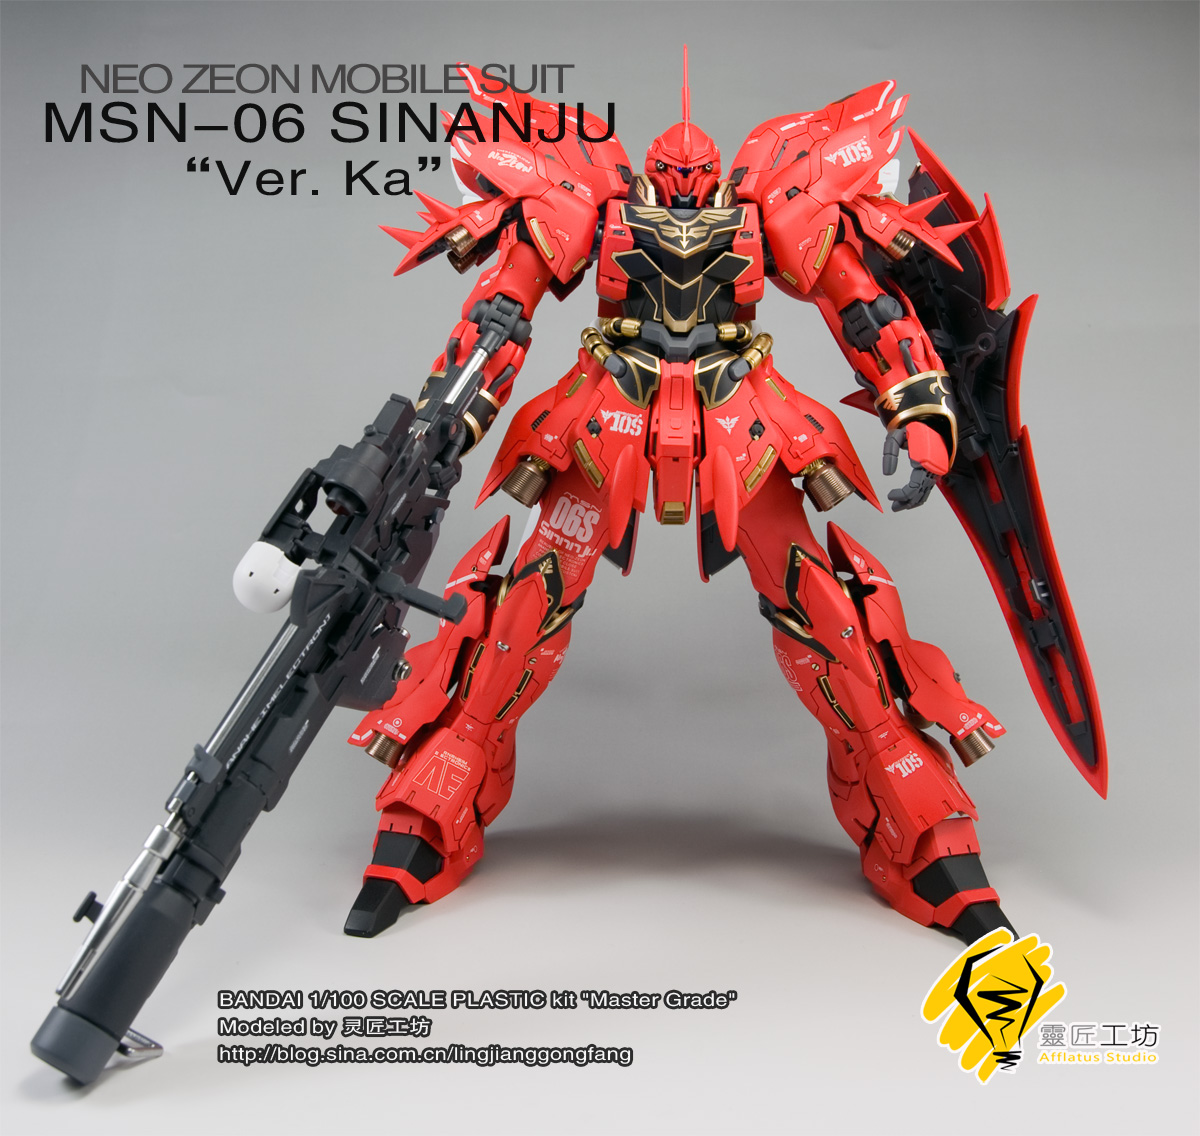 GUNDAM GUY: MG 1/100 MSN-06S Sinanju Ver. Ka - Customized ...